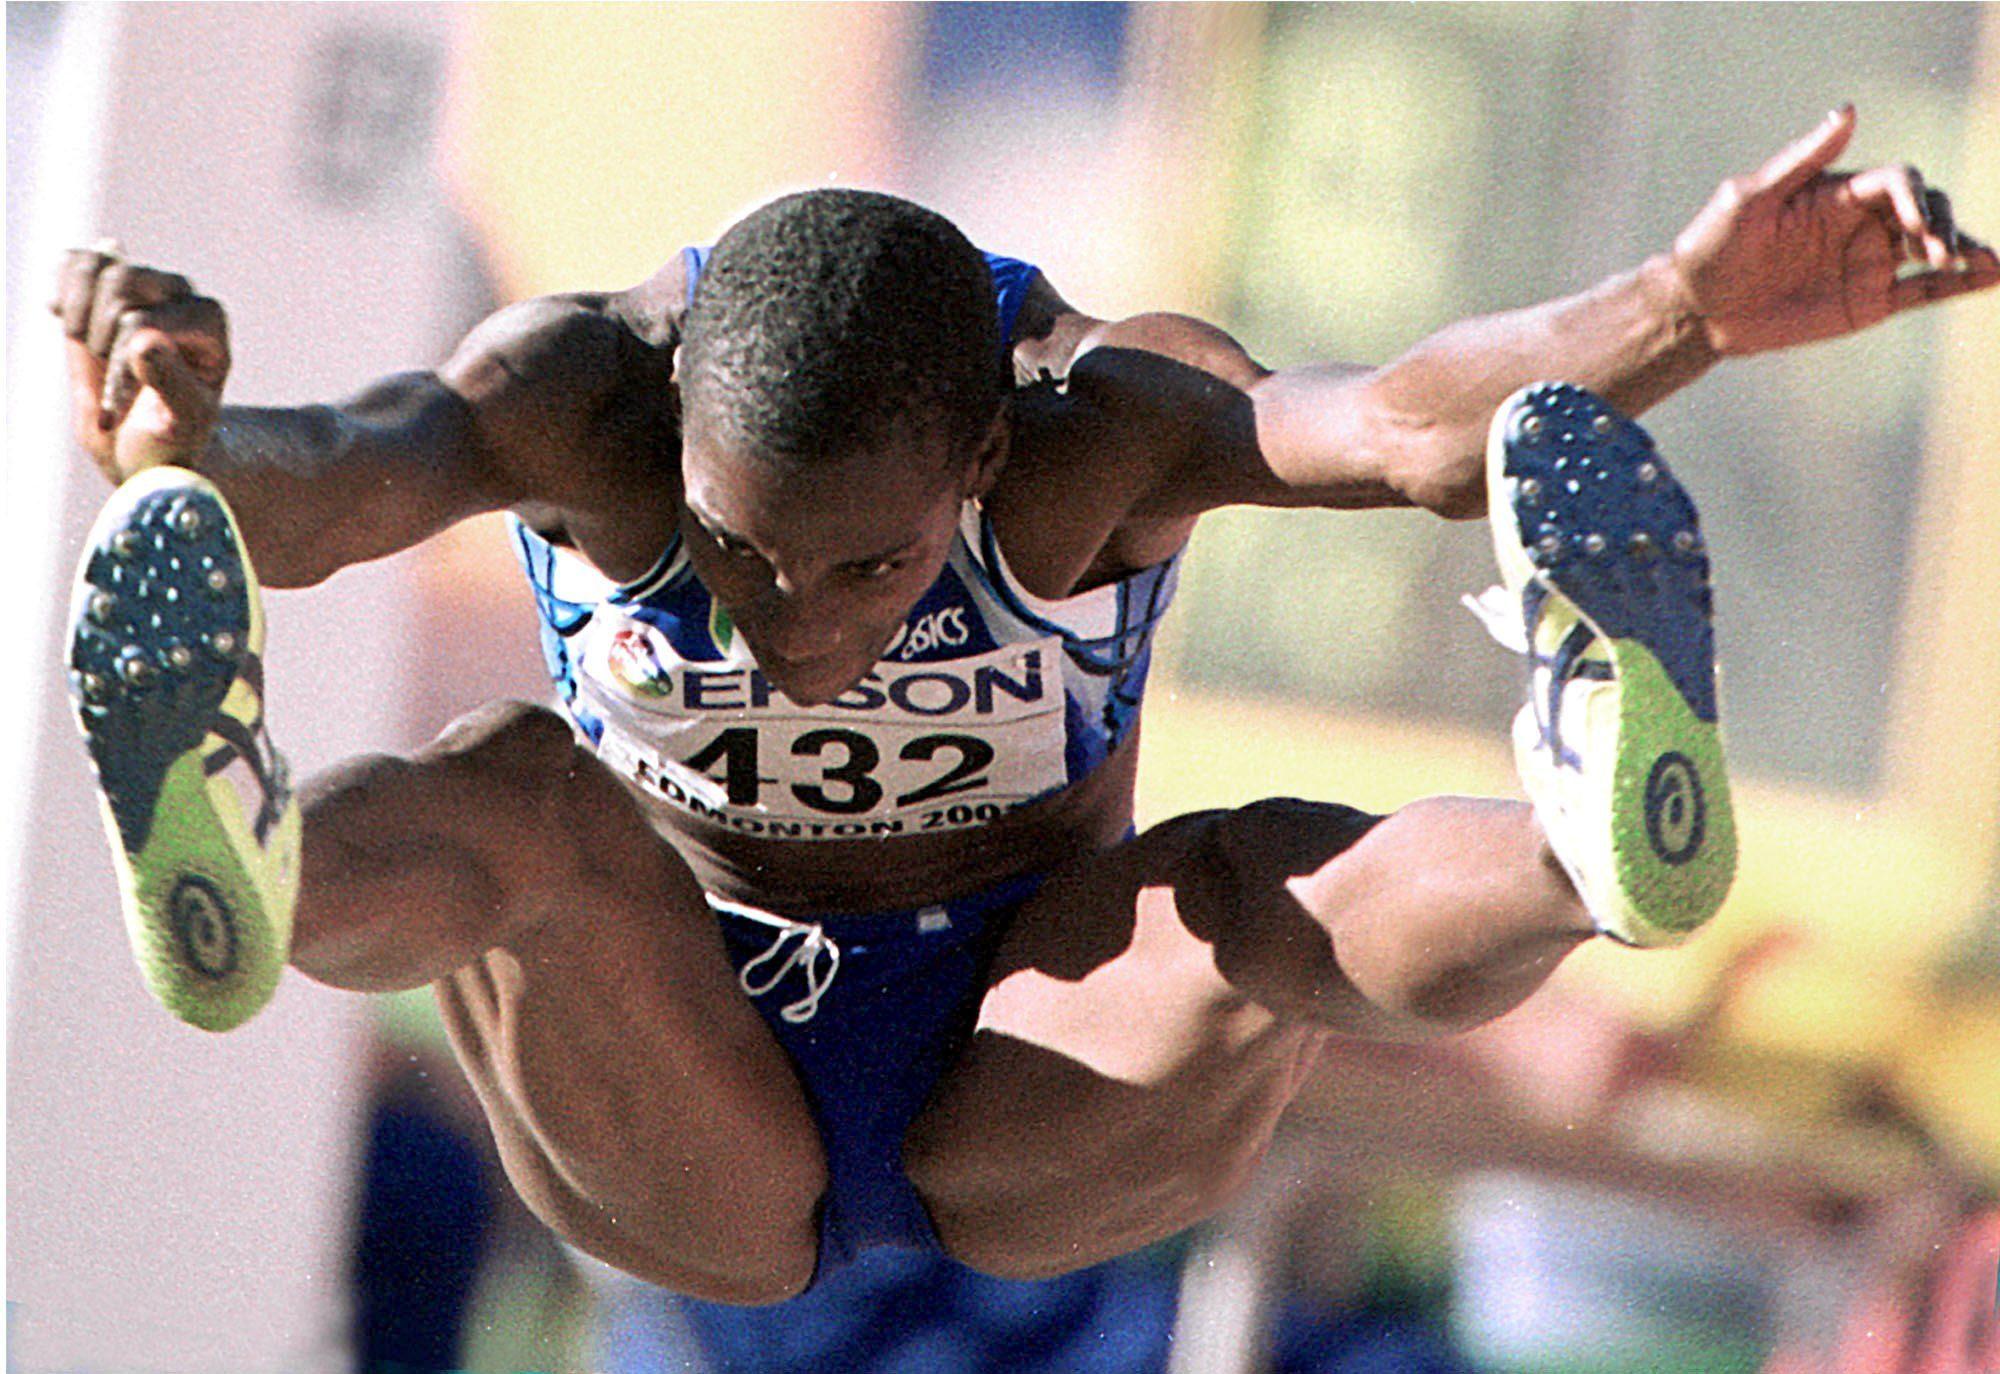 atletica leggera fiona may salto in lungo italia italy atletica leggera athletics long jump atlanta 1996 sydney 2000 argento silver